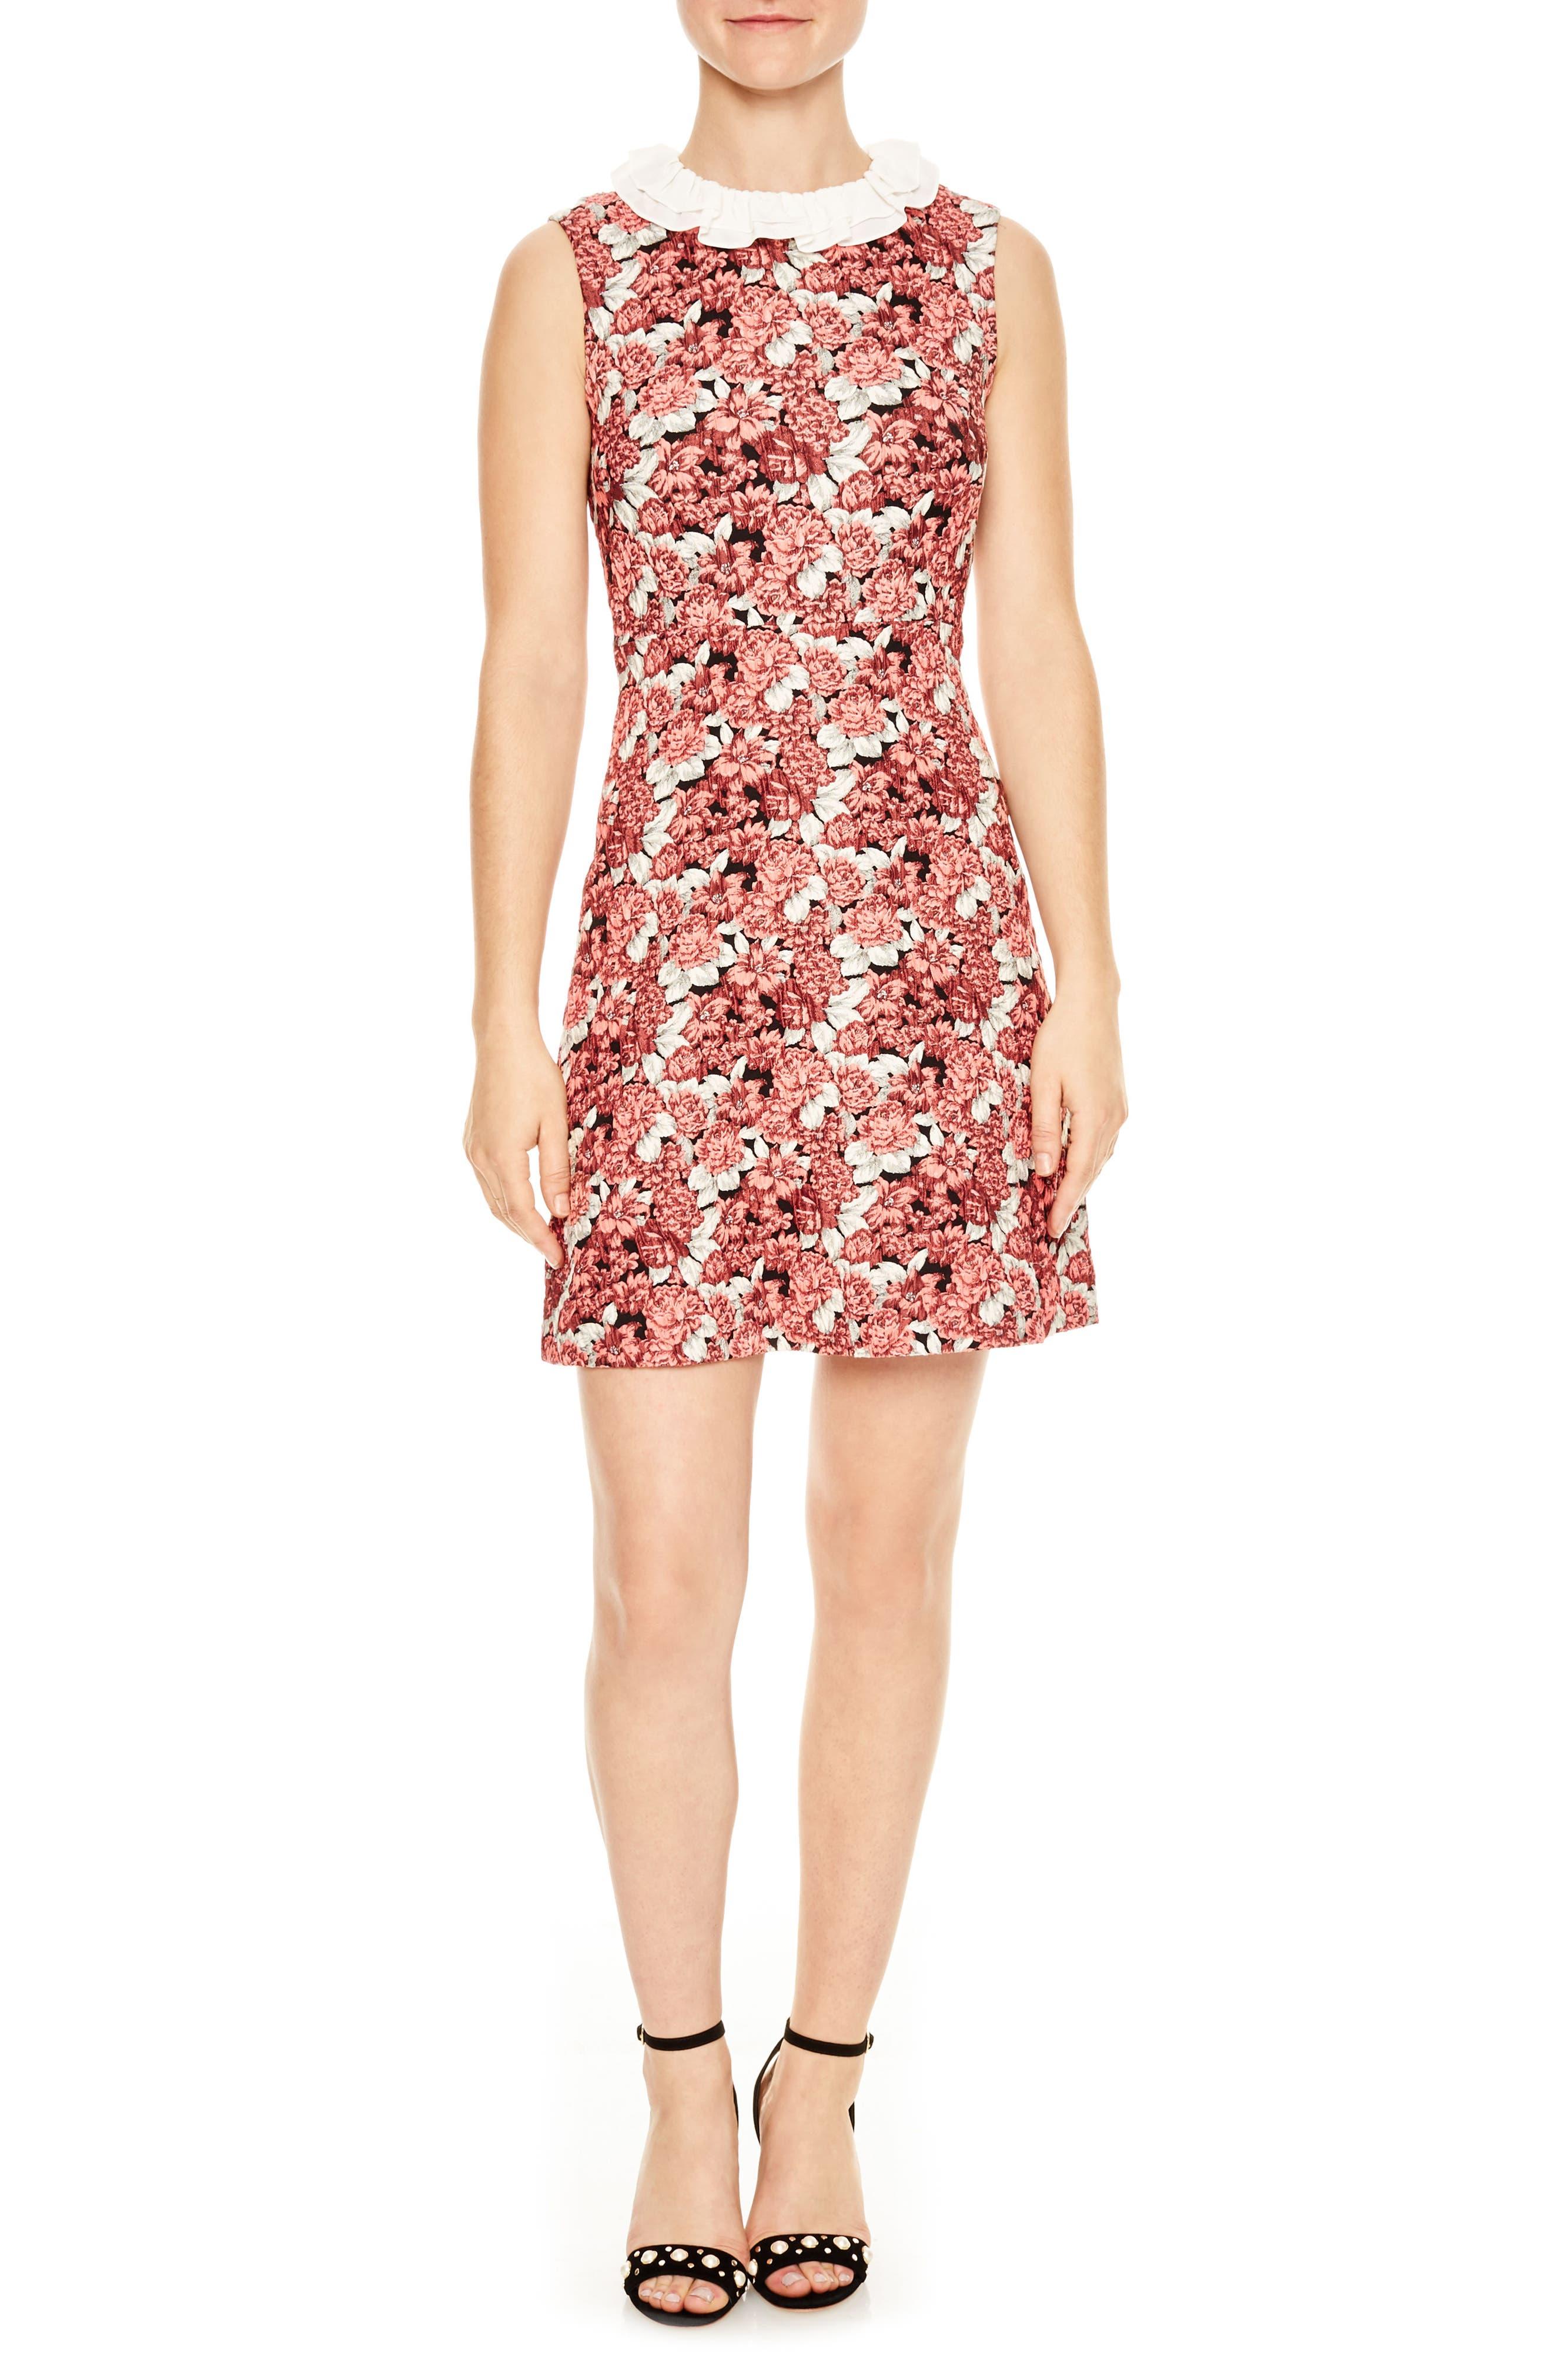 Edwige Floral Print Sheath Dress,                         Main,                         color,